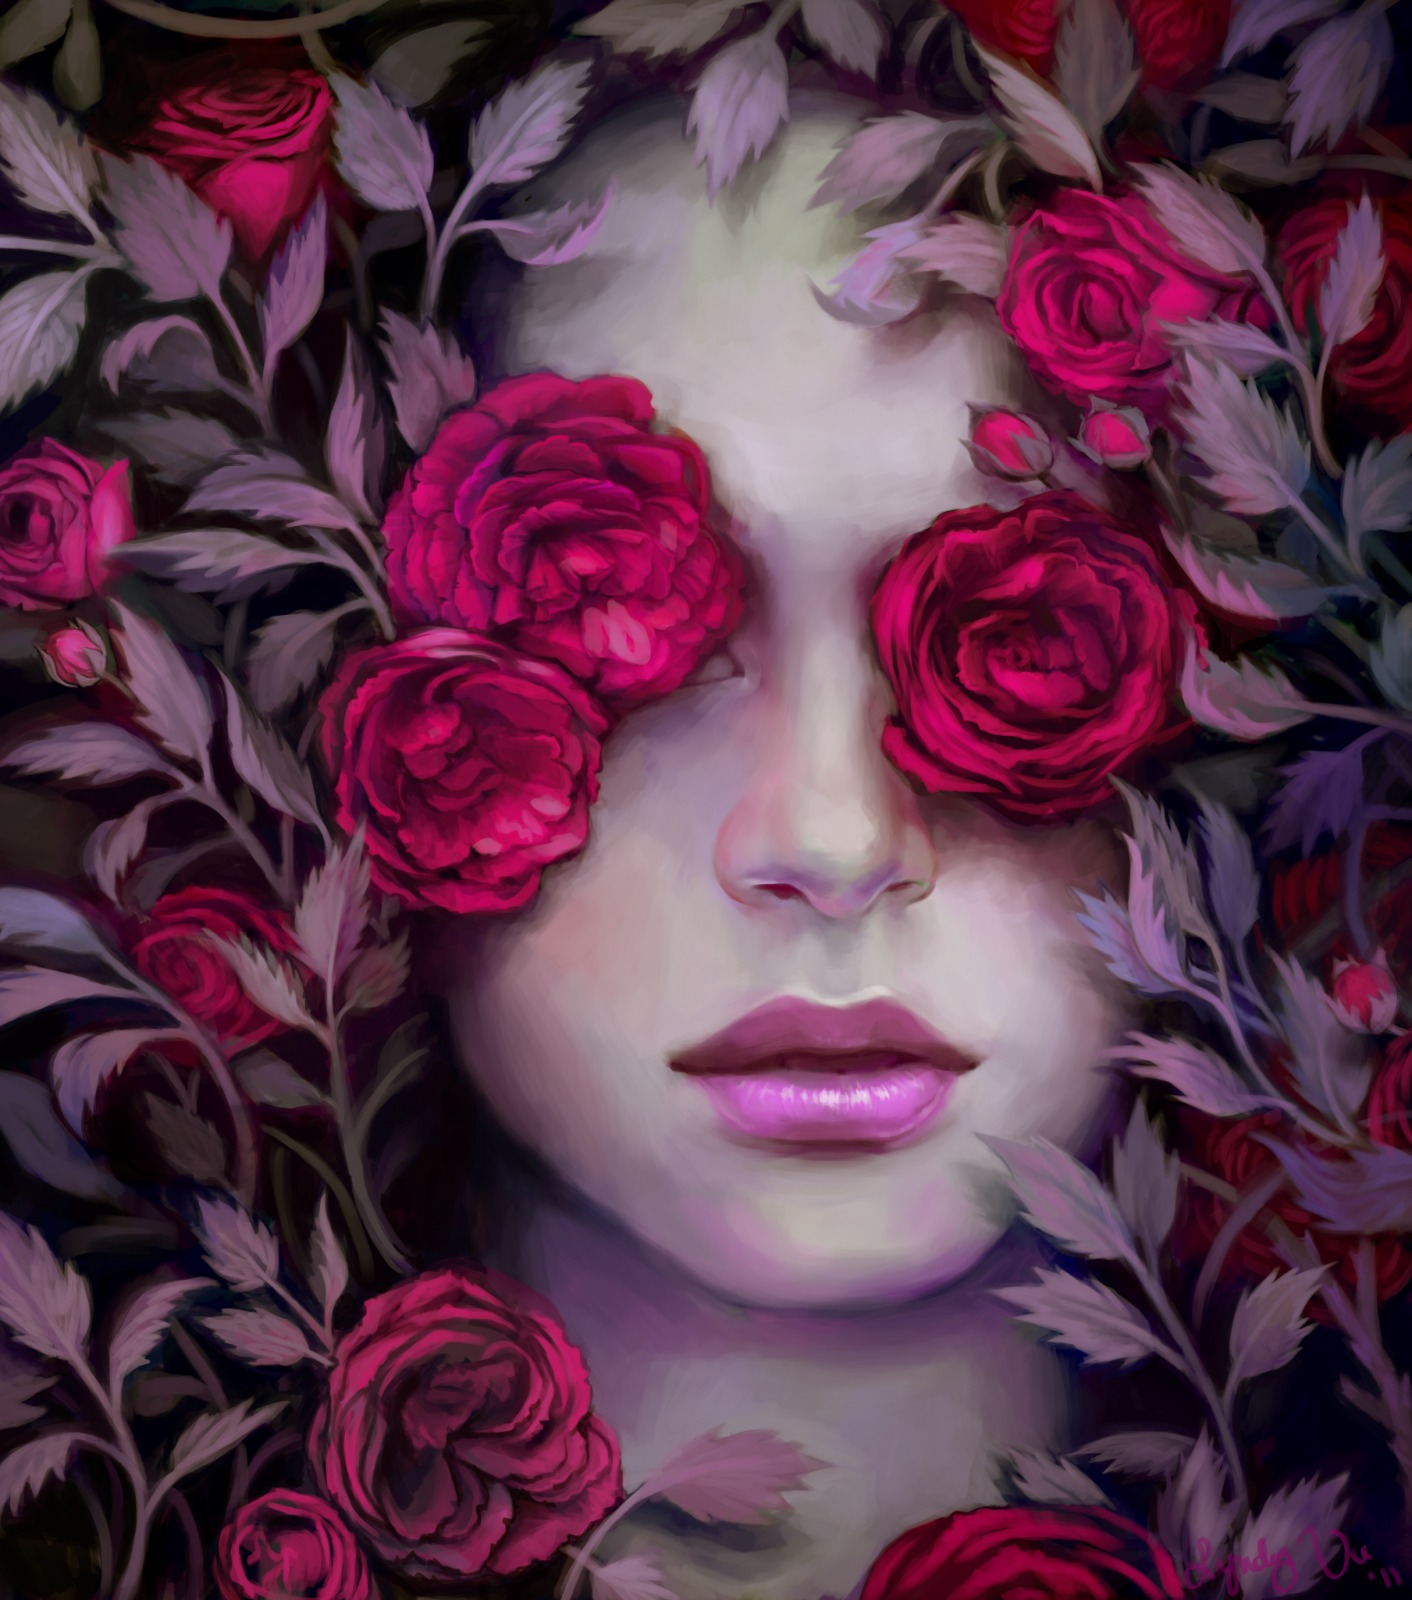 A  eyes on roses